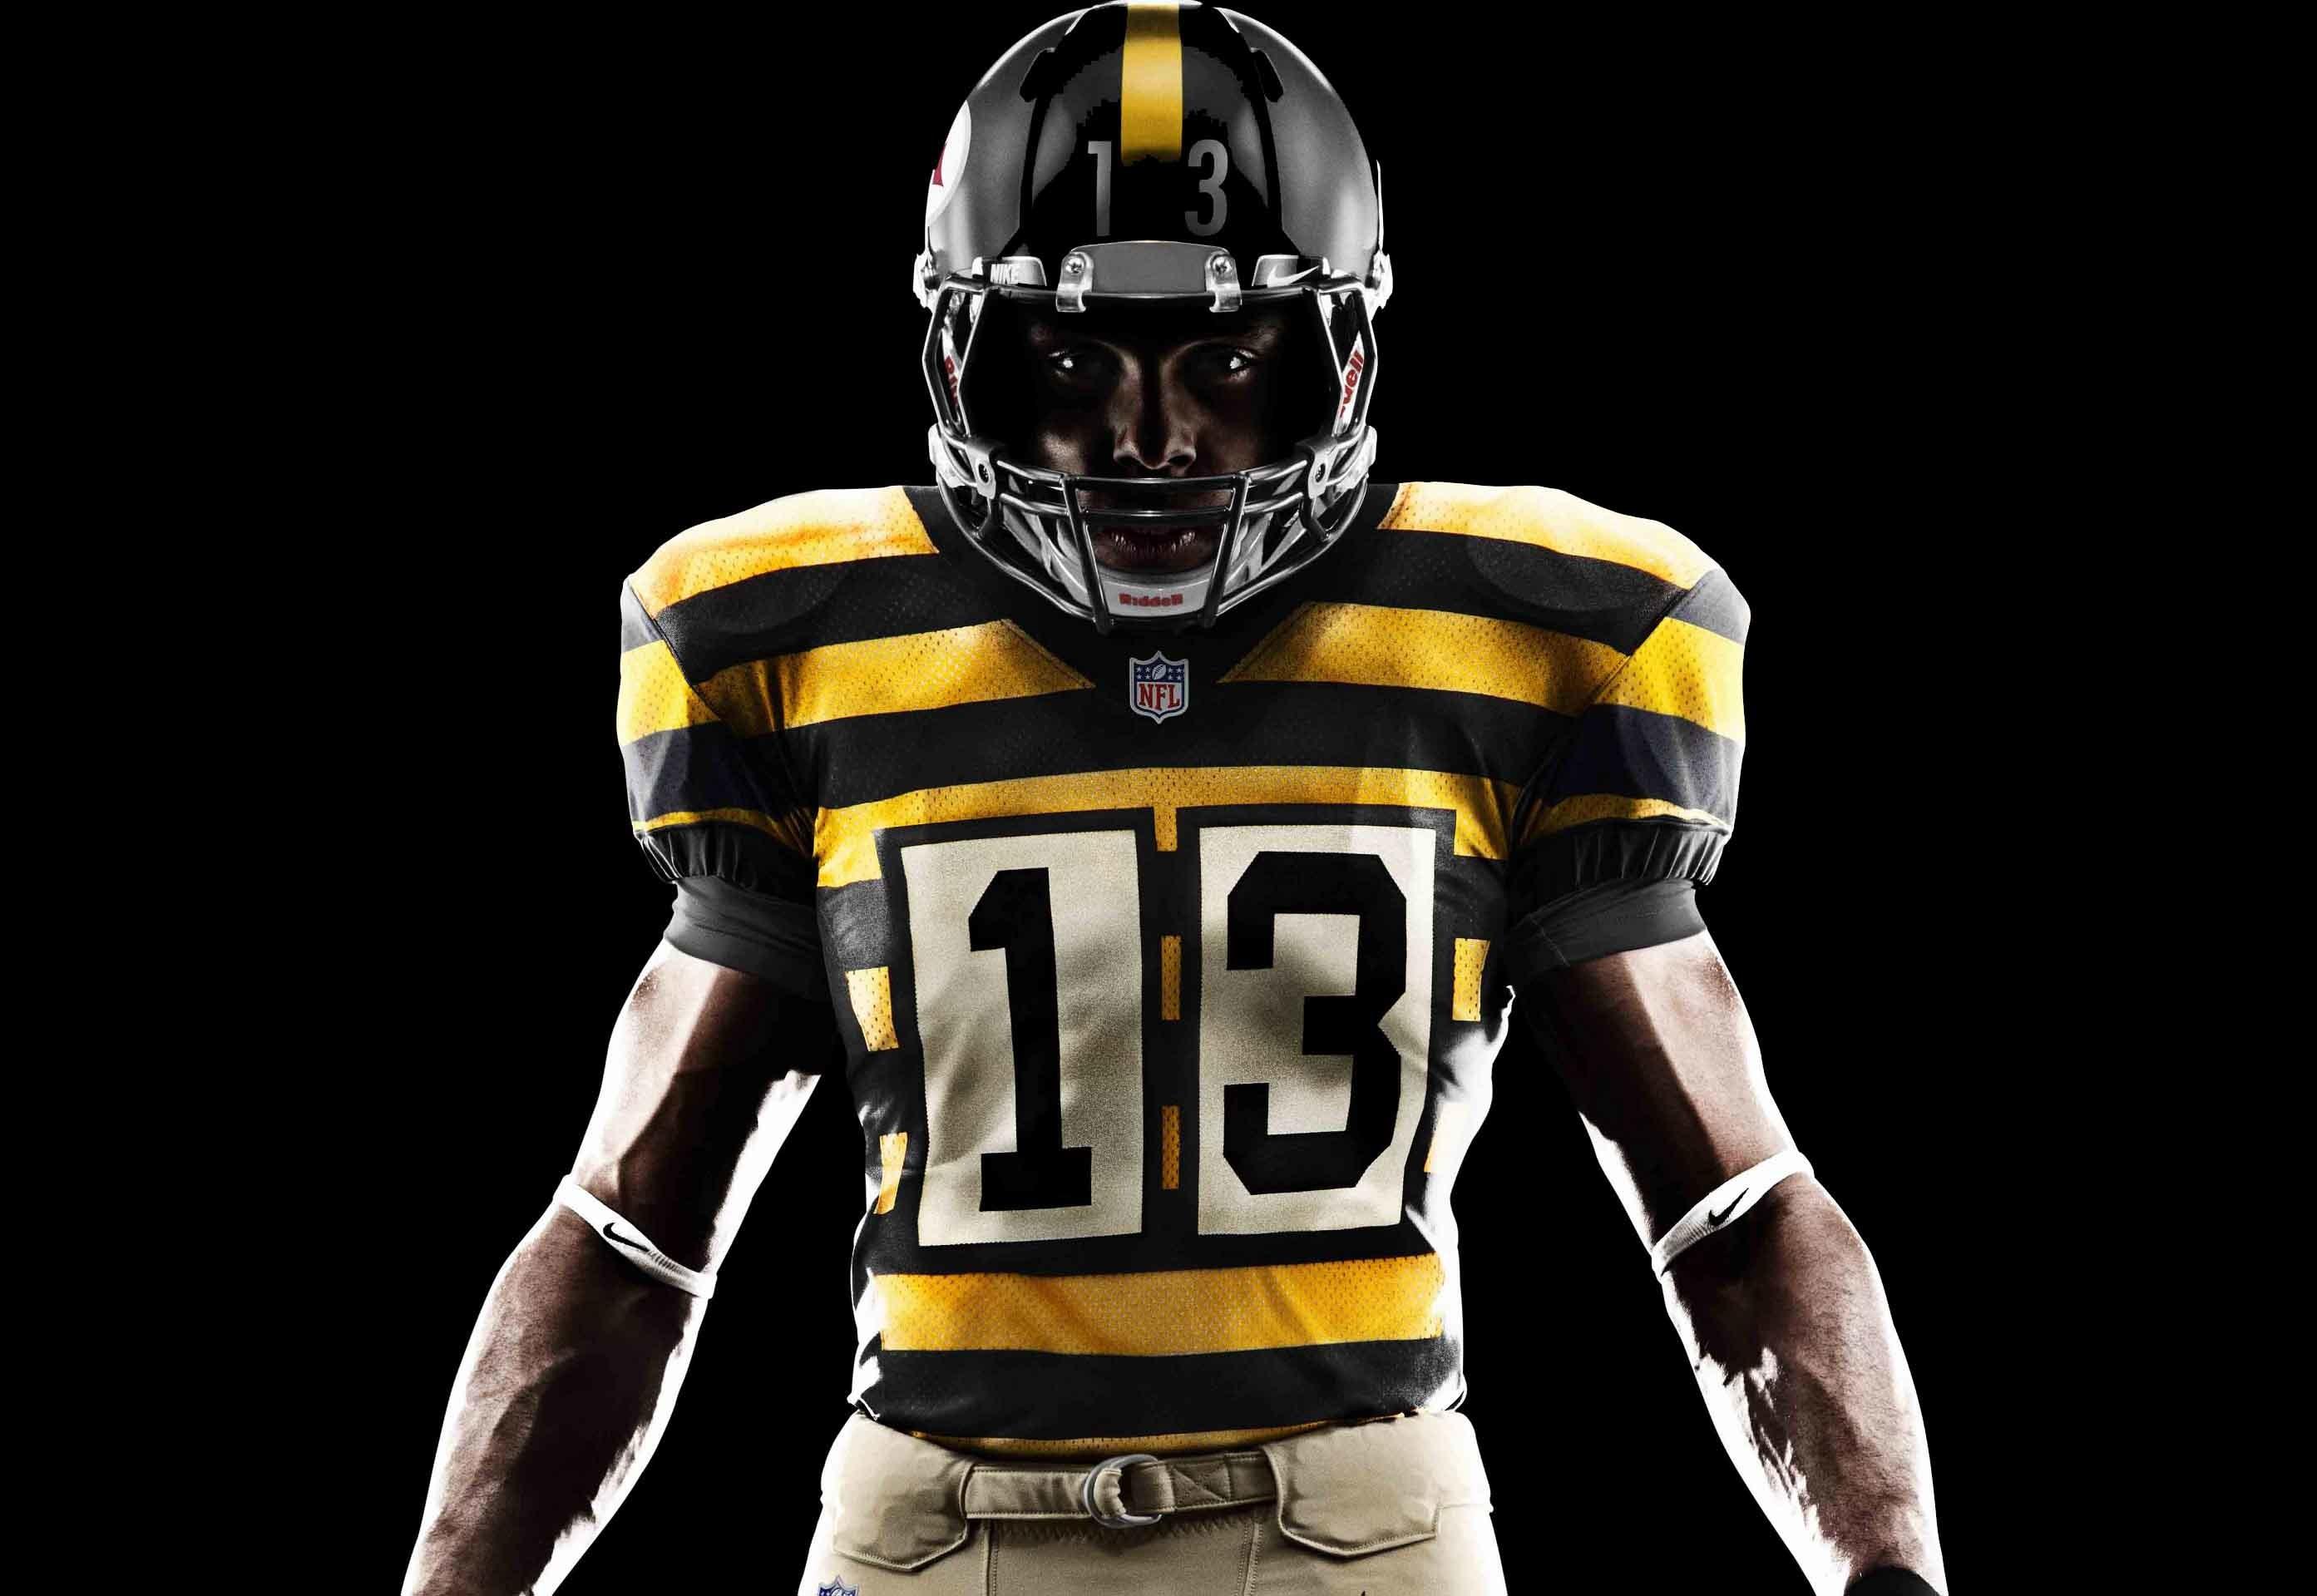 nfl Steelers Football Wallpaper